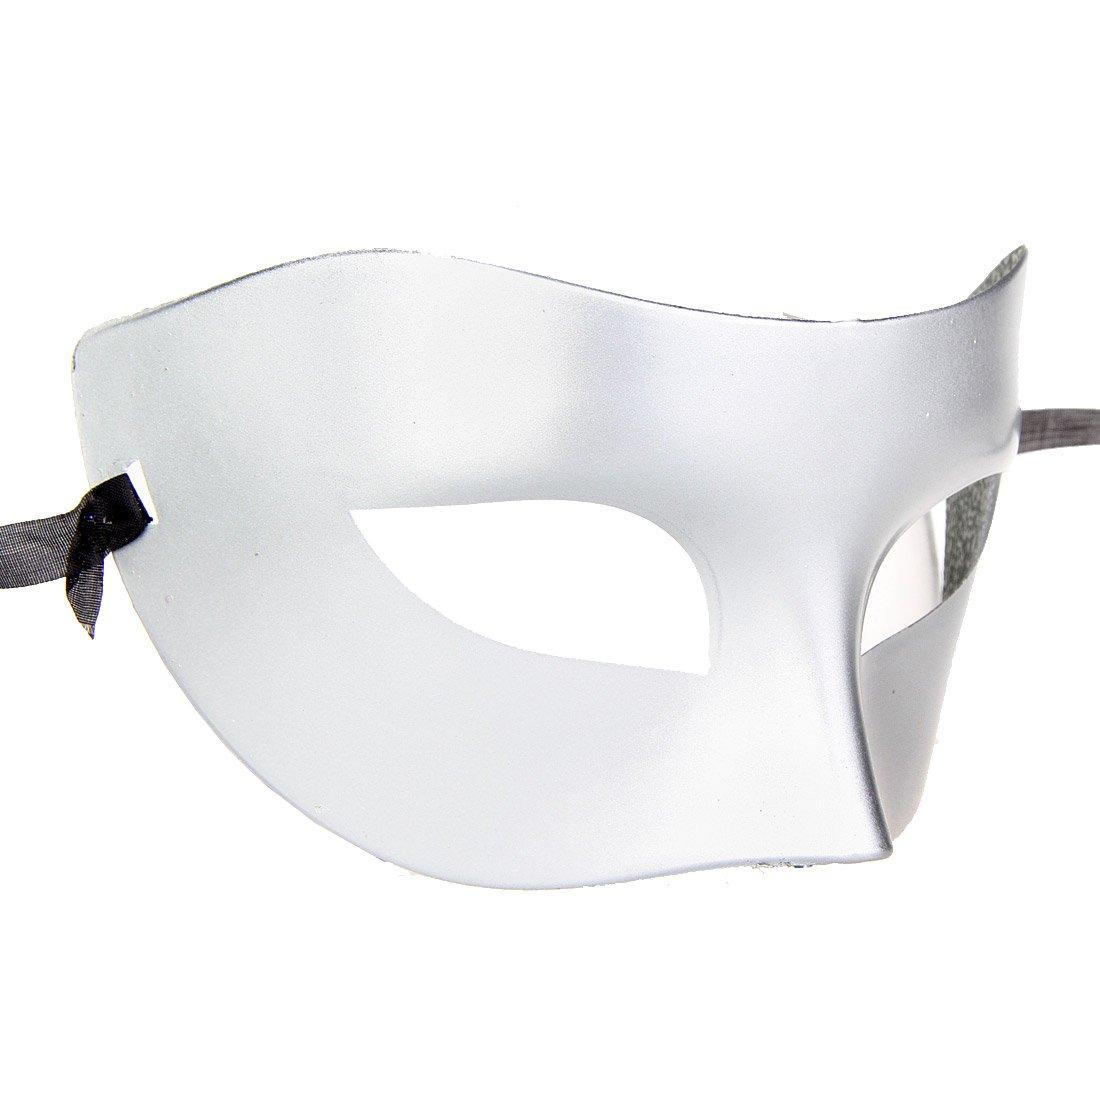 12pcs Set Different Colors Retro Masquerade Mask Mardi Gras Costume Party Accessory